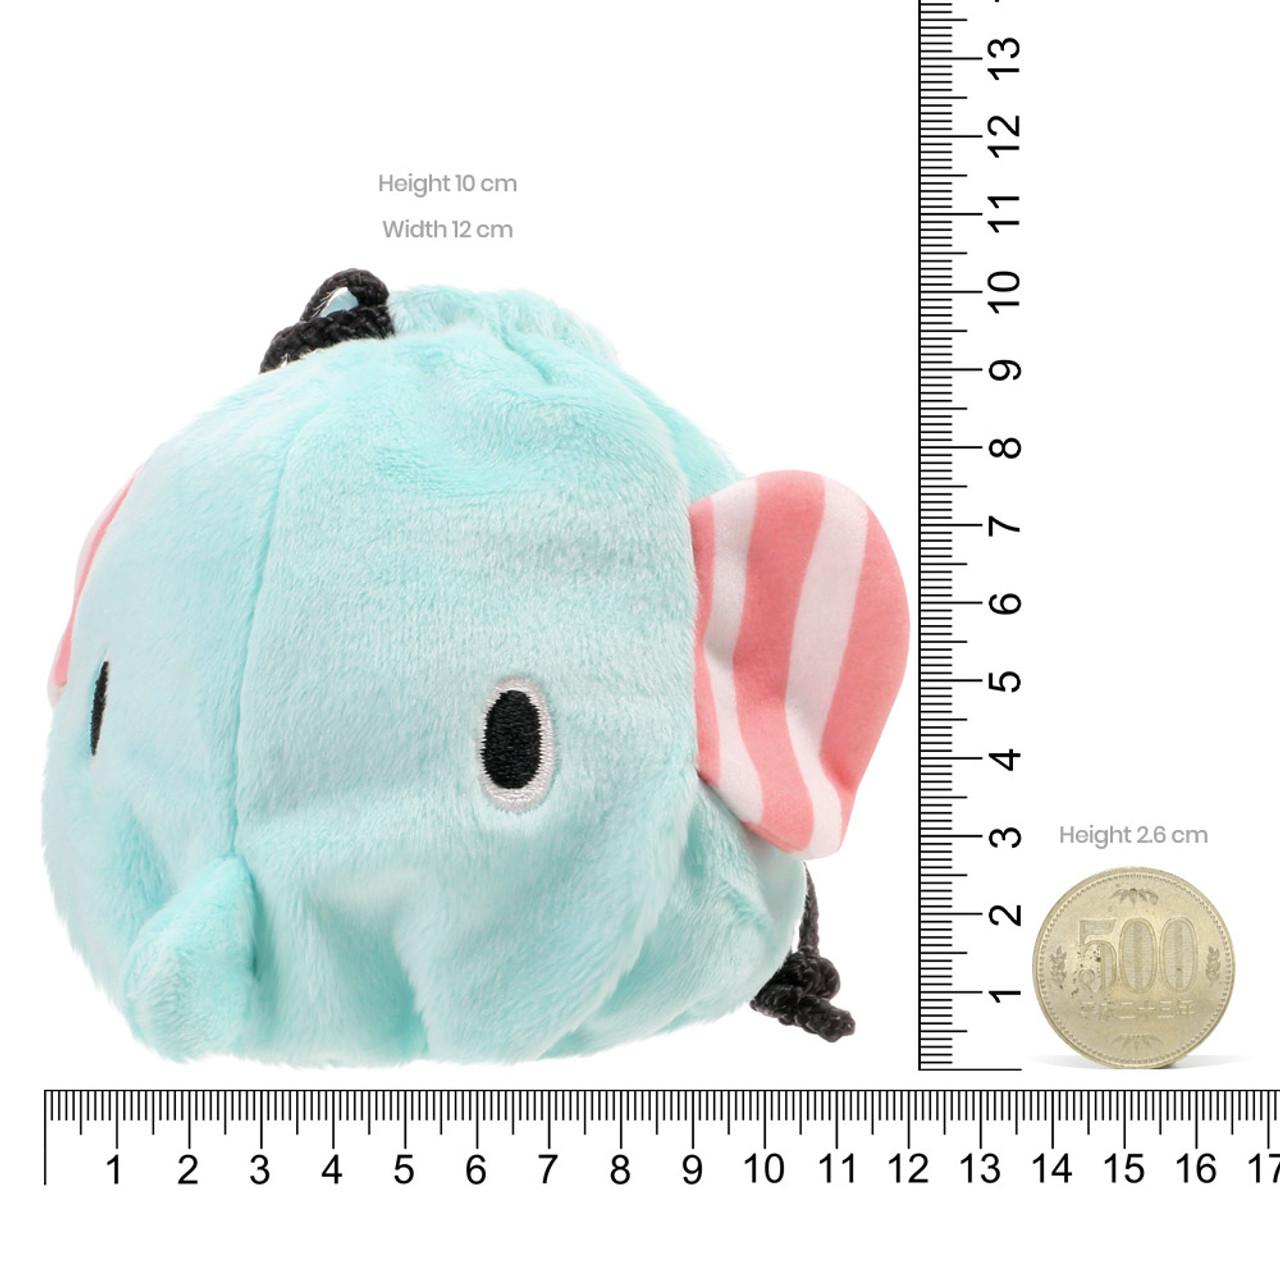 Sentimental Circus Mouton Elephant Face Plush Drawstring Bag ( Proportion )